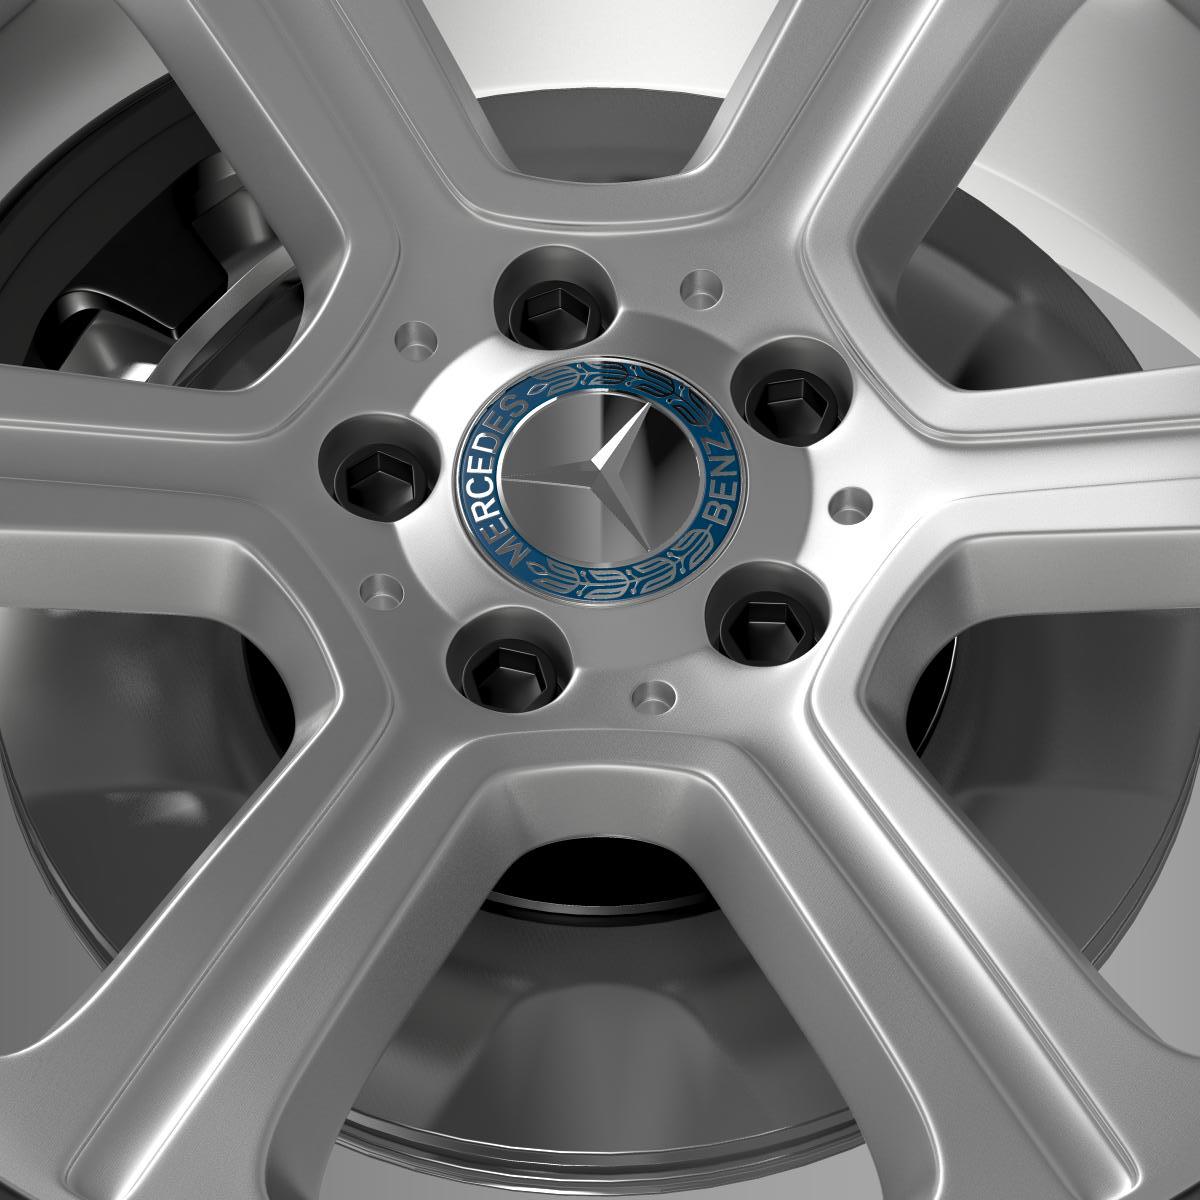 mercedes benz c 300 exclusive line wheel 3d model 3ds max fbx c4d lwo ma mb hrc xsi obj 210775